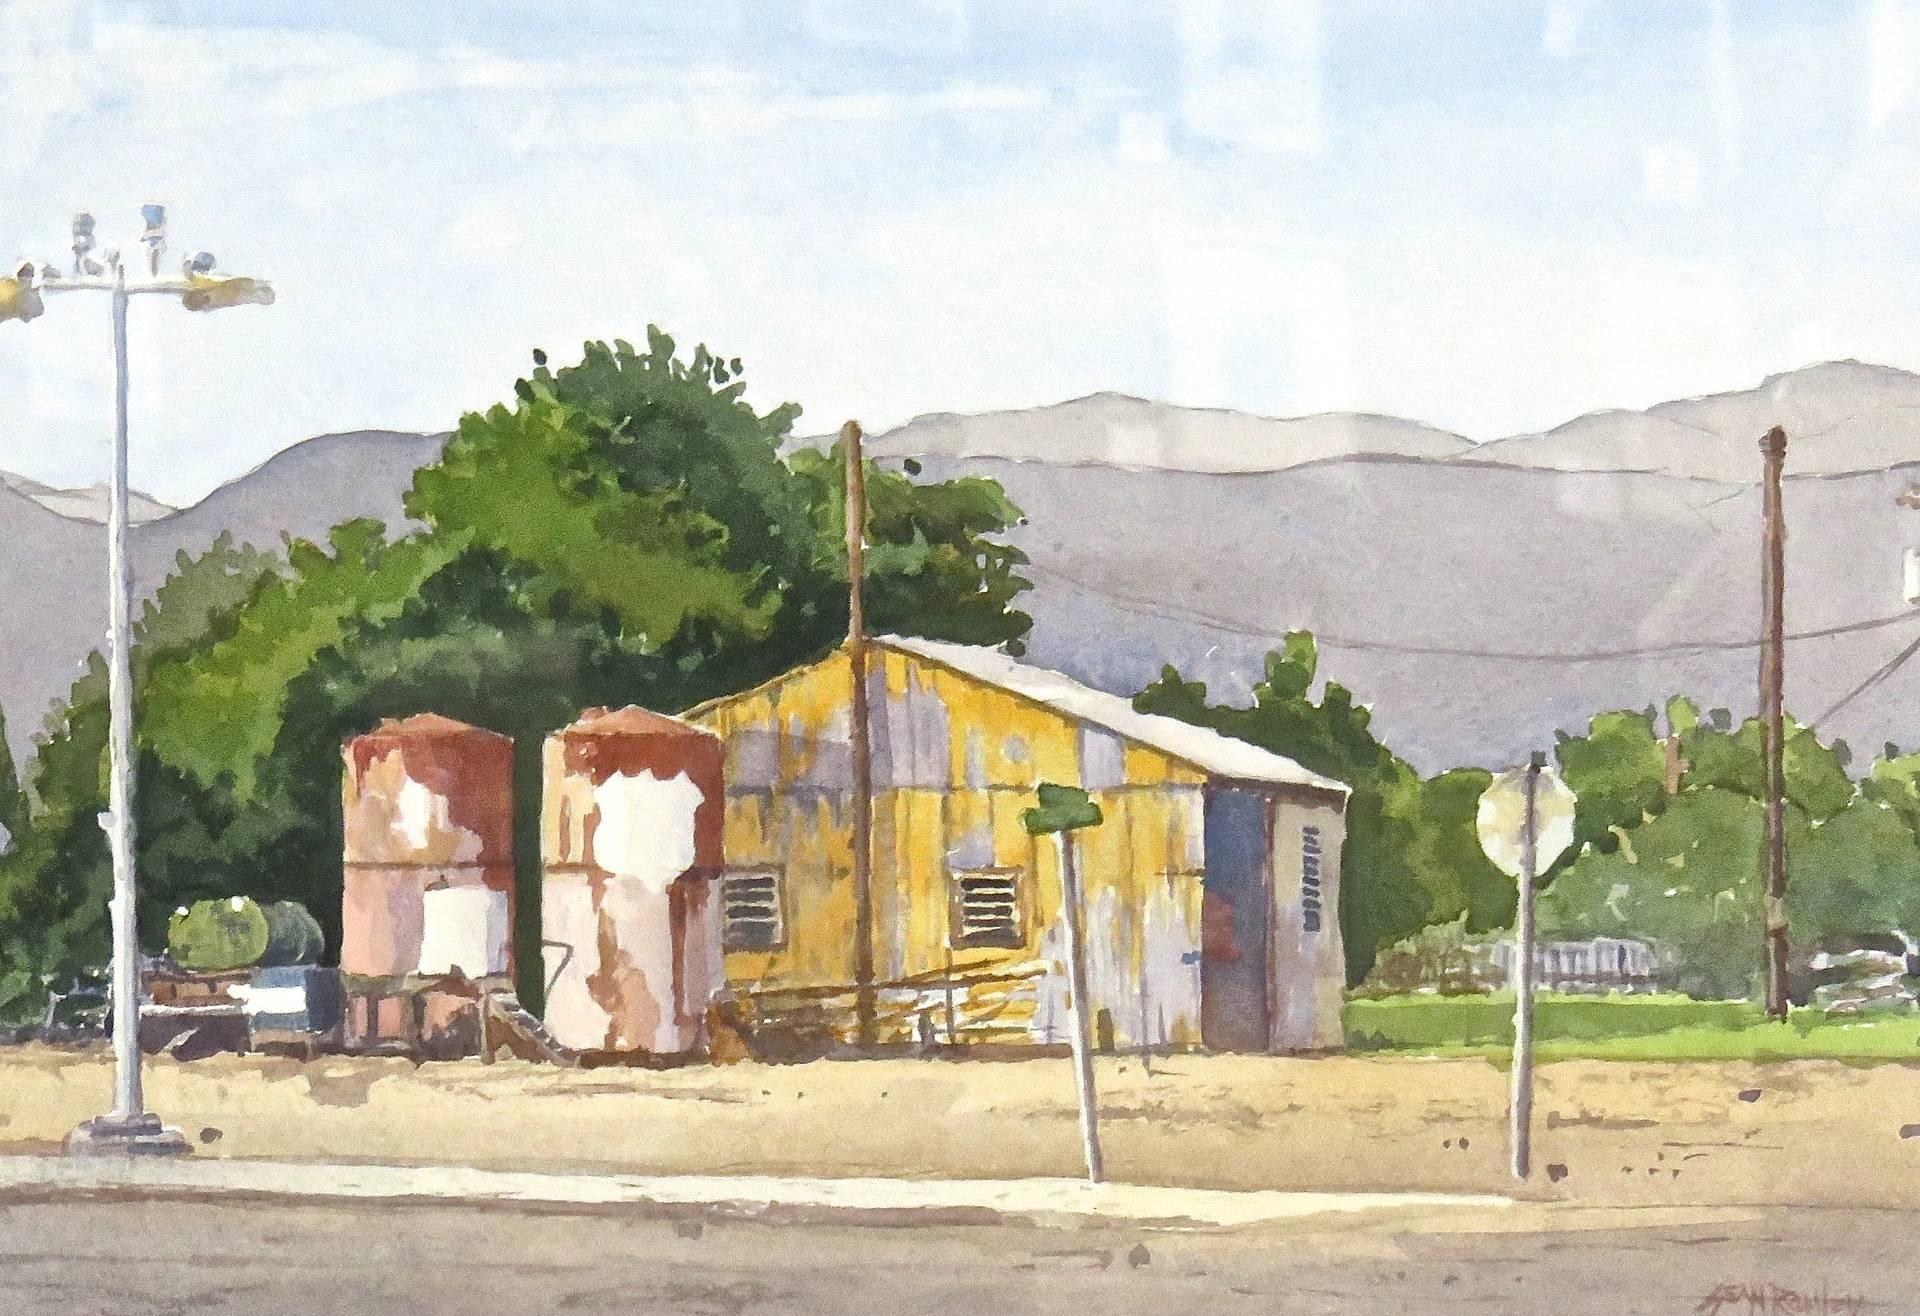 Kanosh Station